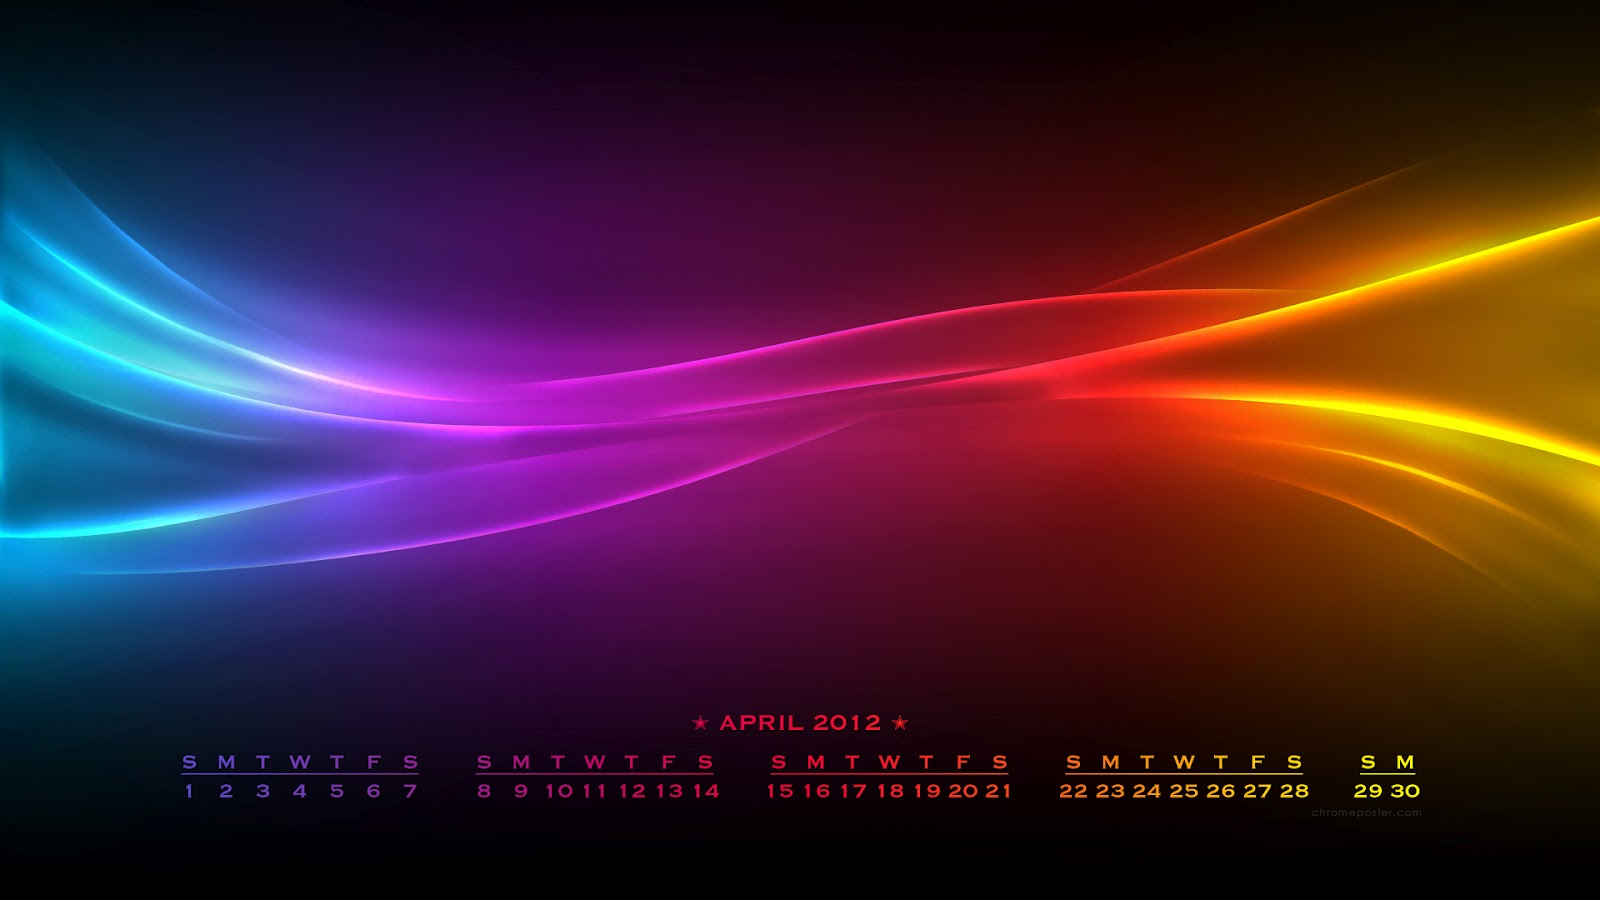 https://1.bp.blogspot.com/-i3y7AlHSn68/T3SLbaWC7PI/AAAAAAAAGhk/8HchilUsWR4/s1600/Color-Pulse-1920-x-1080.jpg